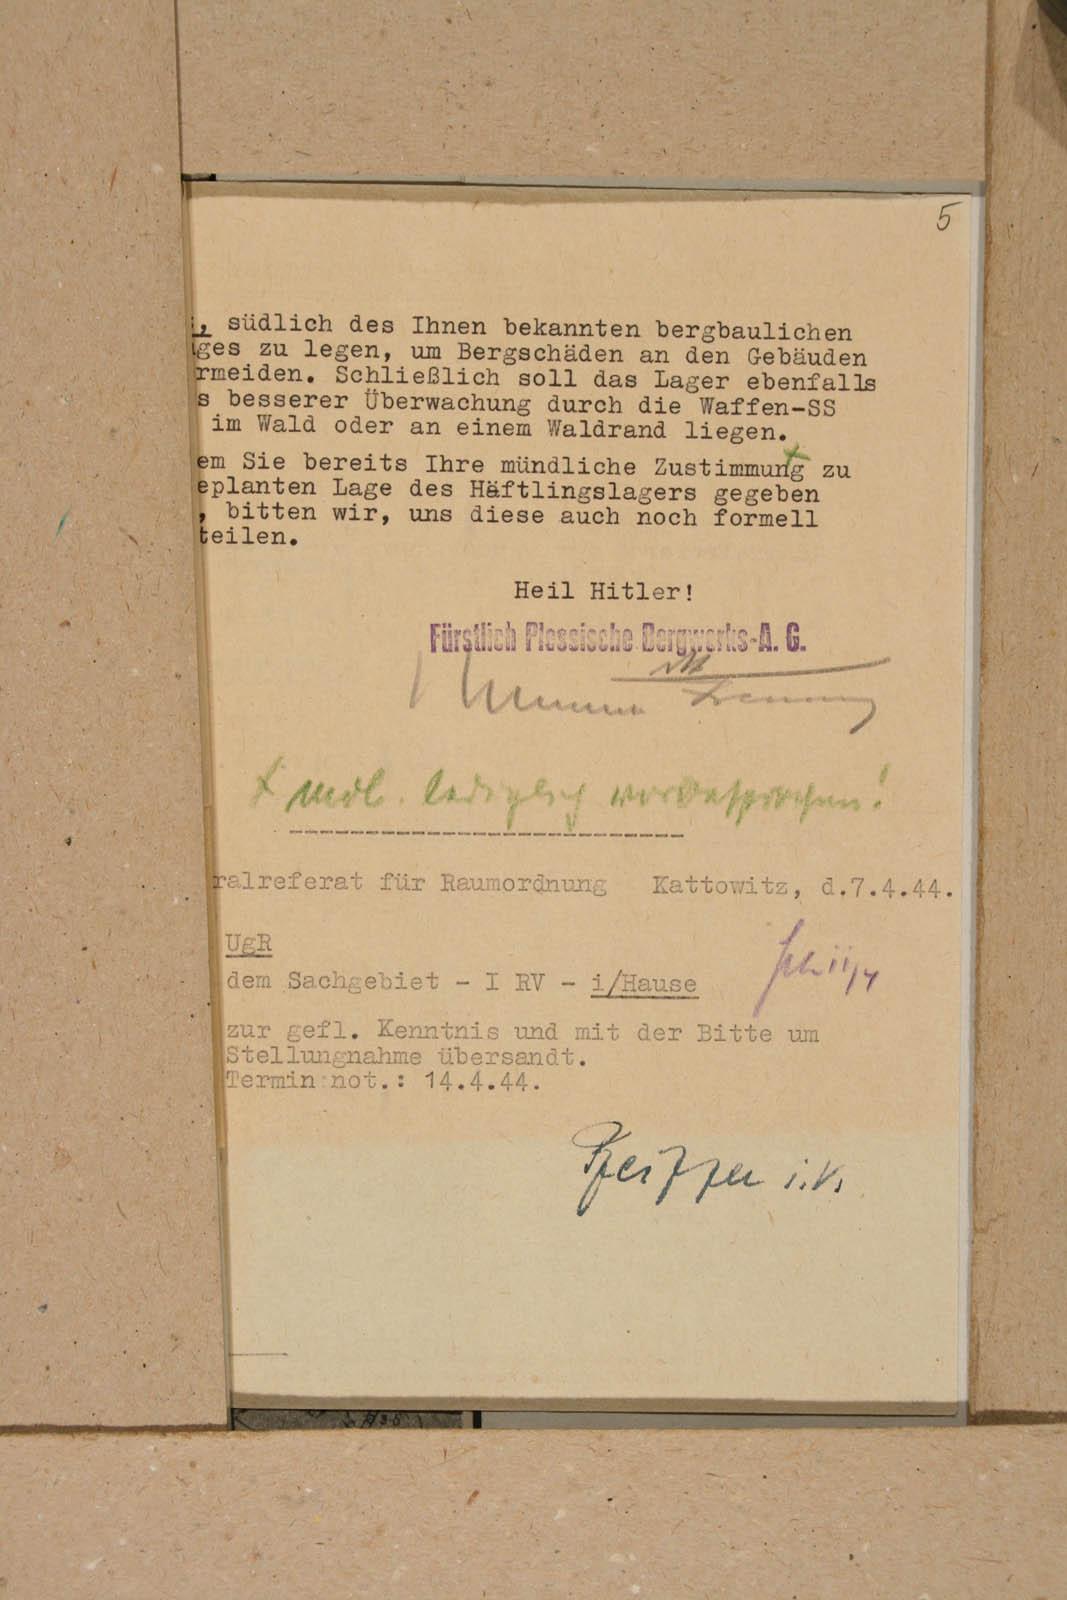 Archiwum Panstwowe w Katowicach Land Pl 12 120 708 05